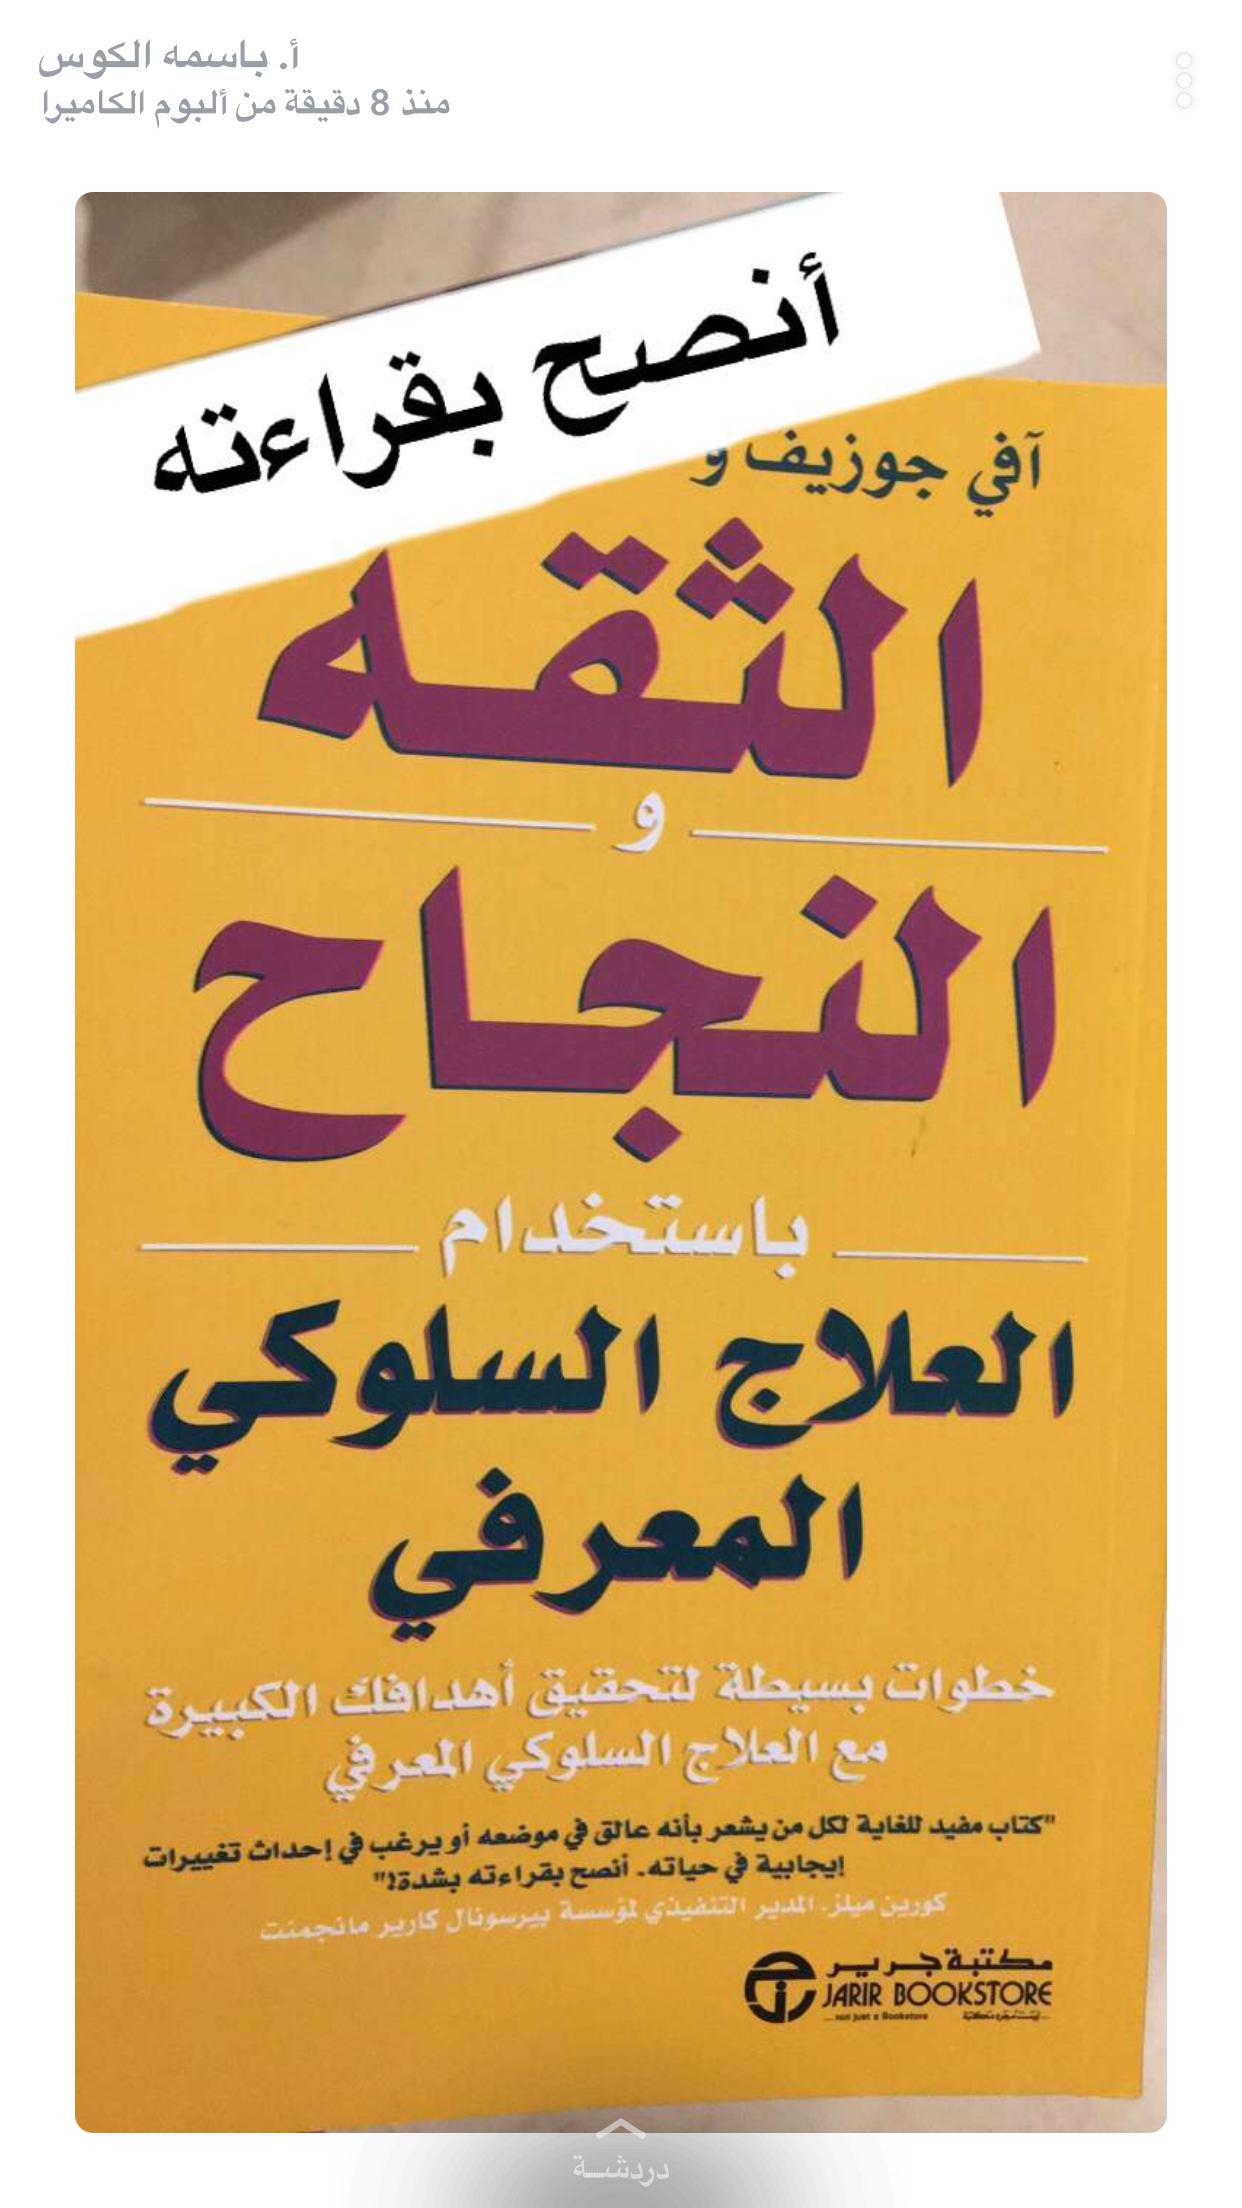 Pin By Maram Mourad On عنايه Books Inspirational Books Arabic Books